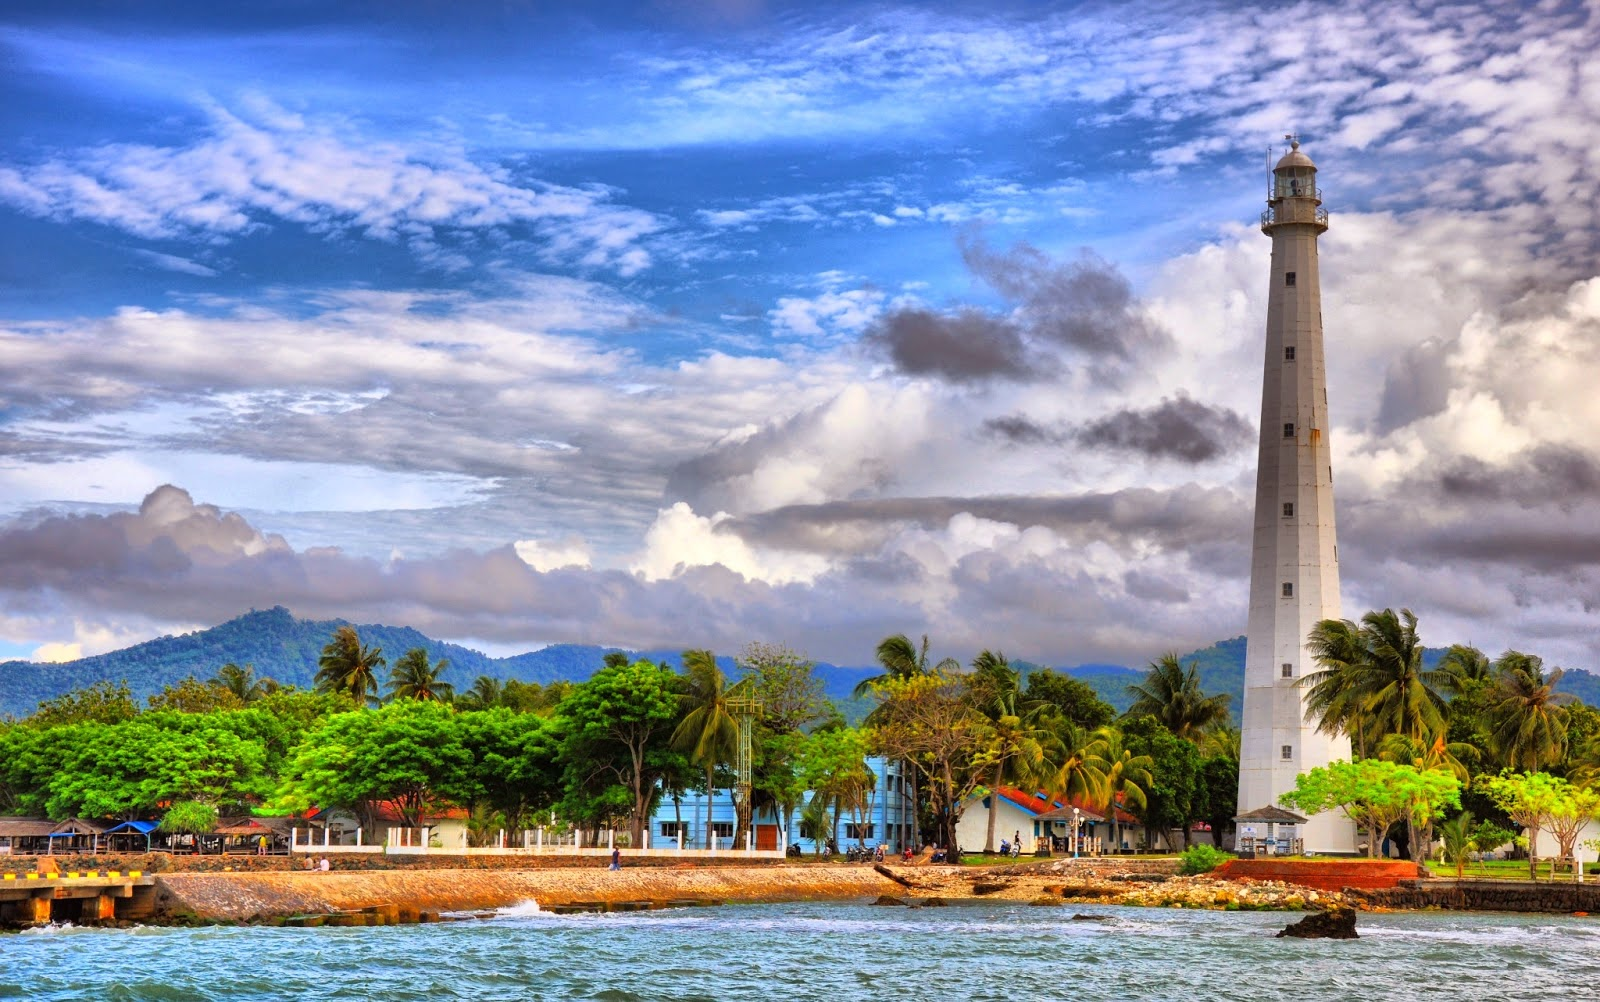 Destinasi Pantai Terkenal Travel Wisata Anyer Ngetren Topik Kab Serang